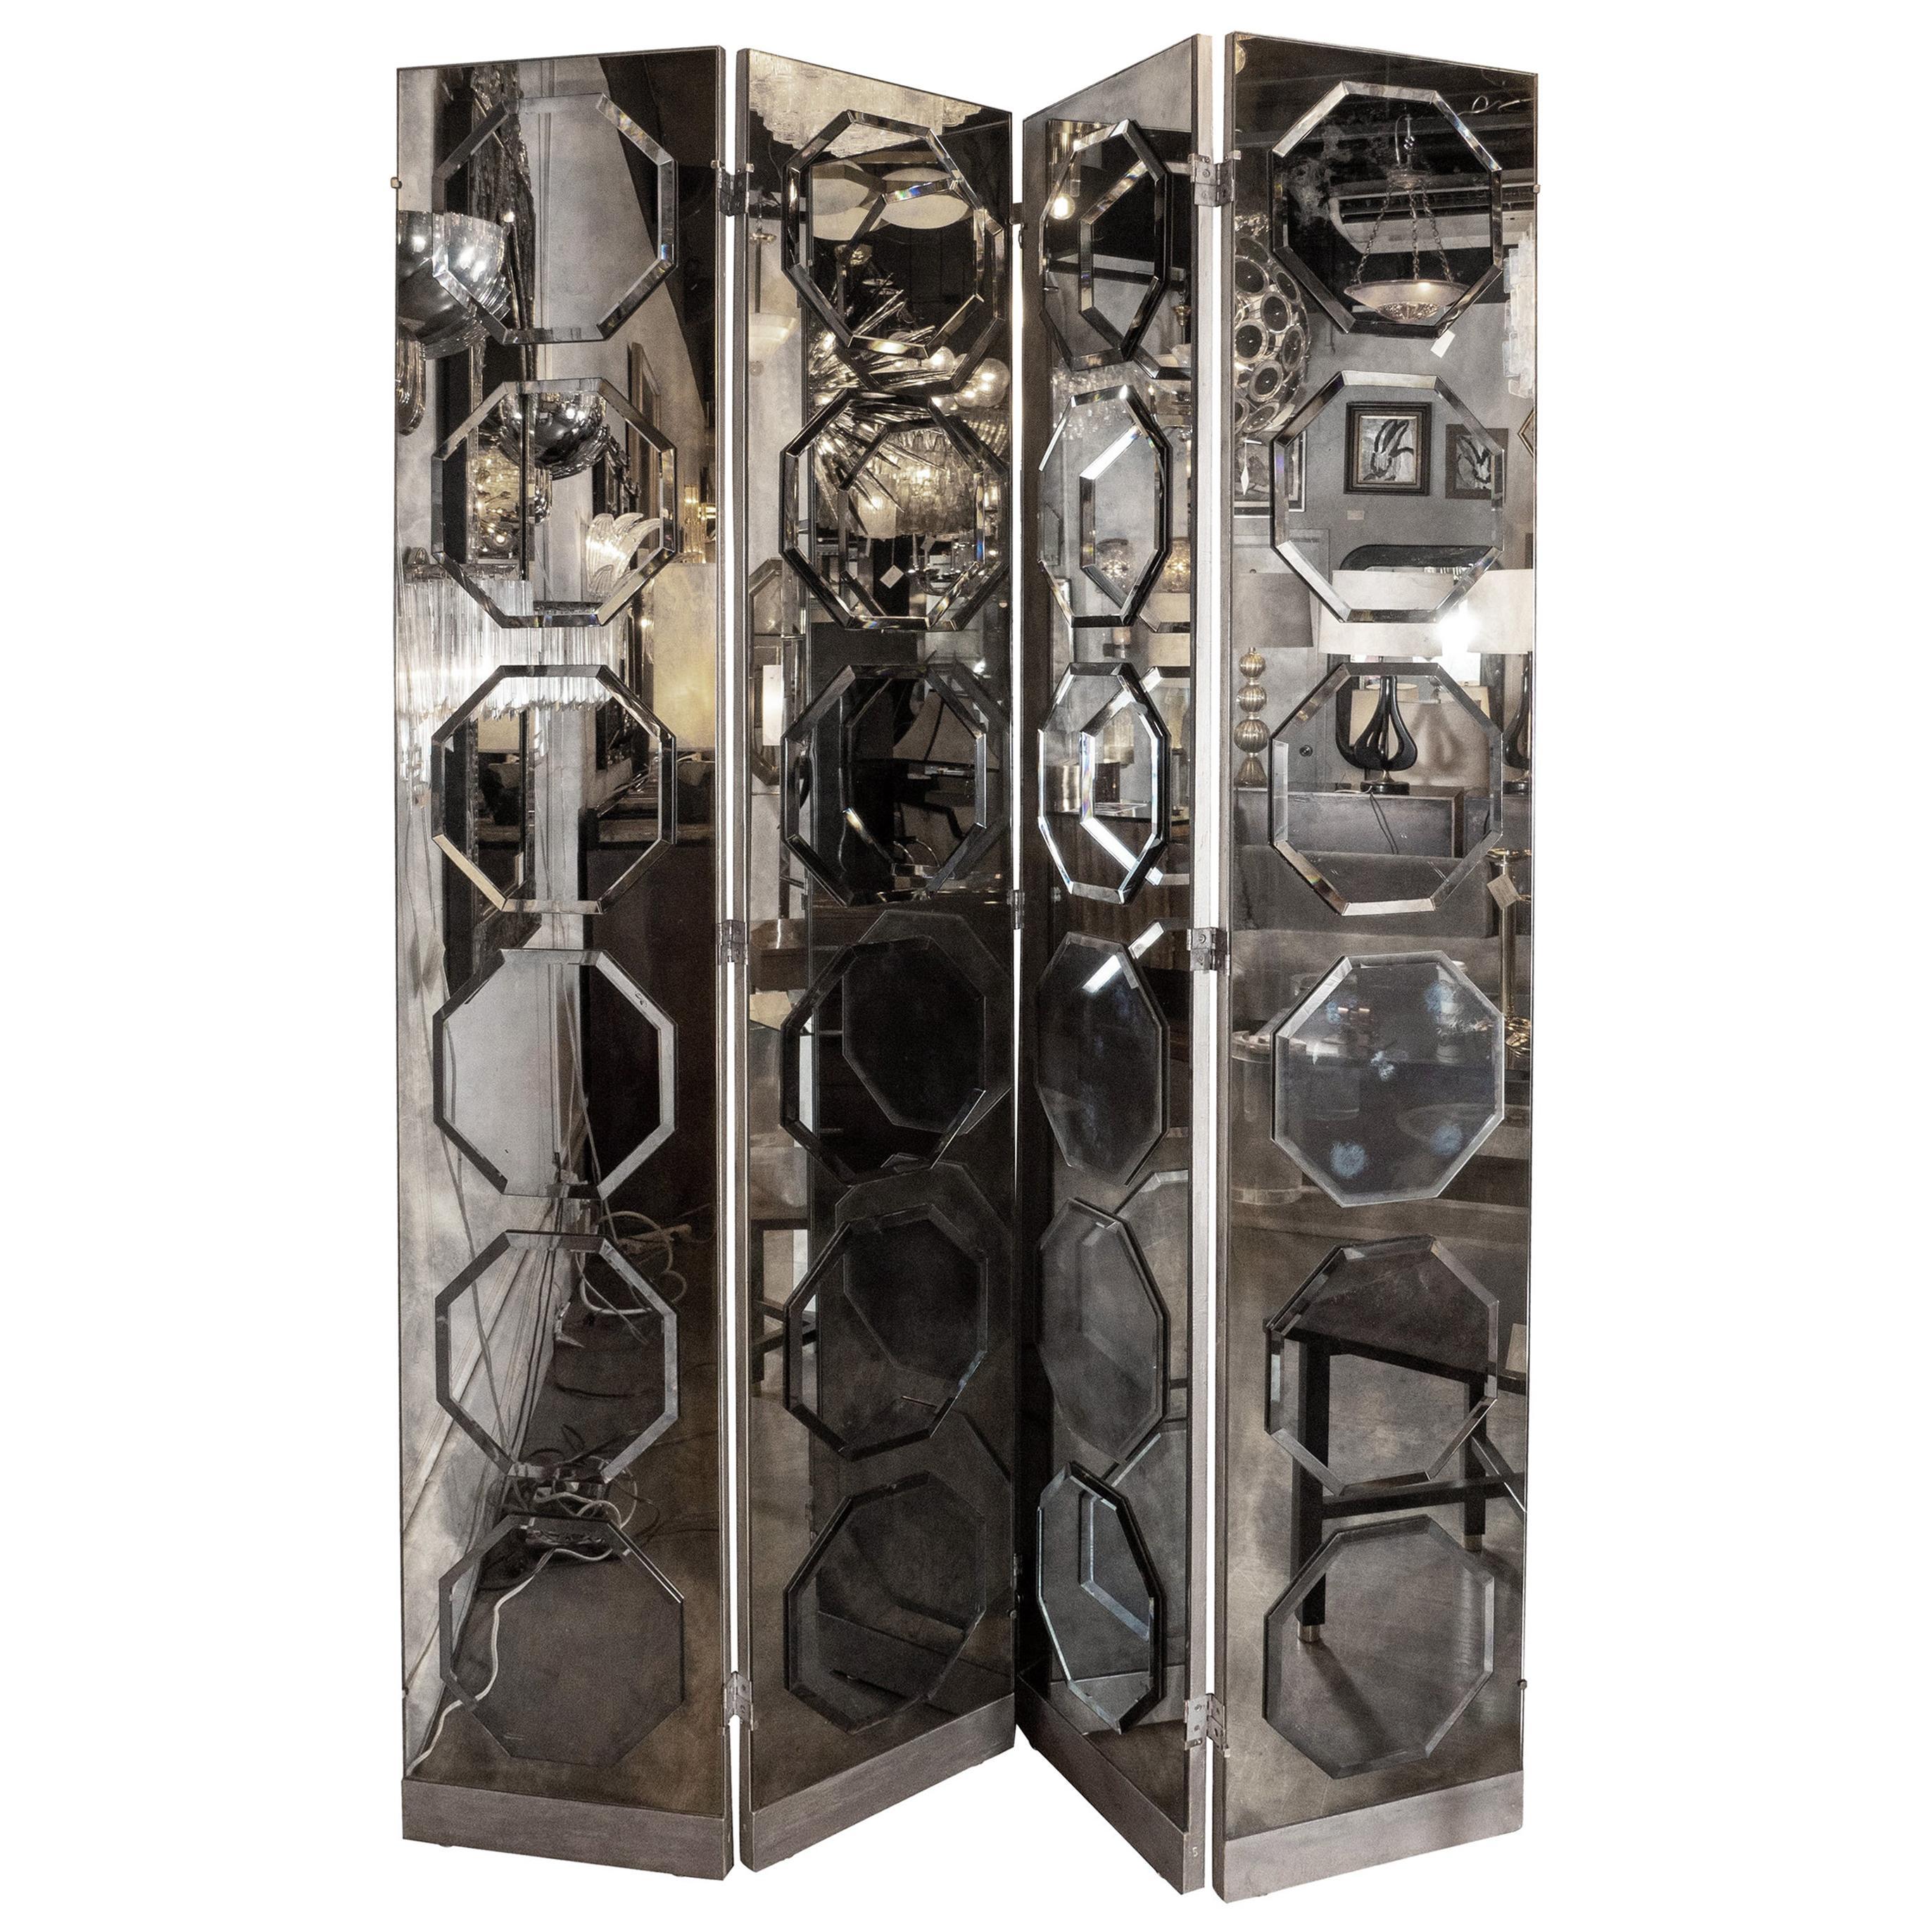 Art Deco 4-Panel Screen Smoked Antique Mirror Screen with Octagonal Appliqués